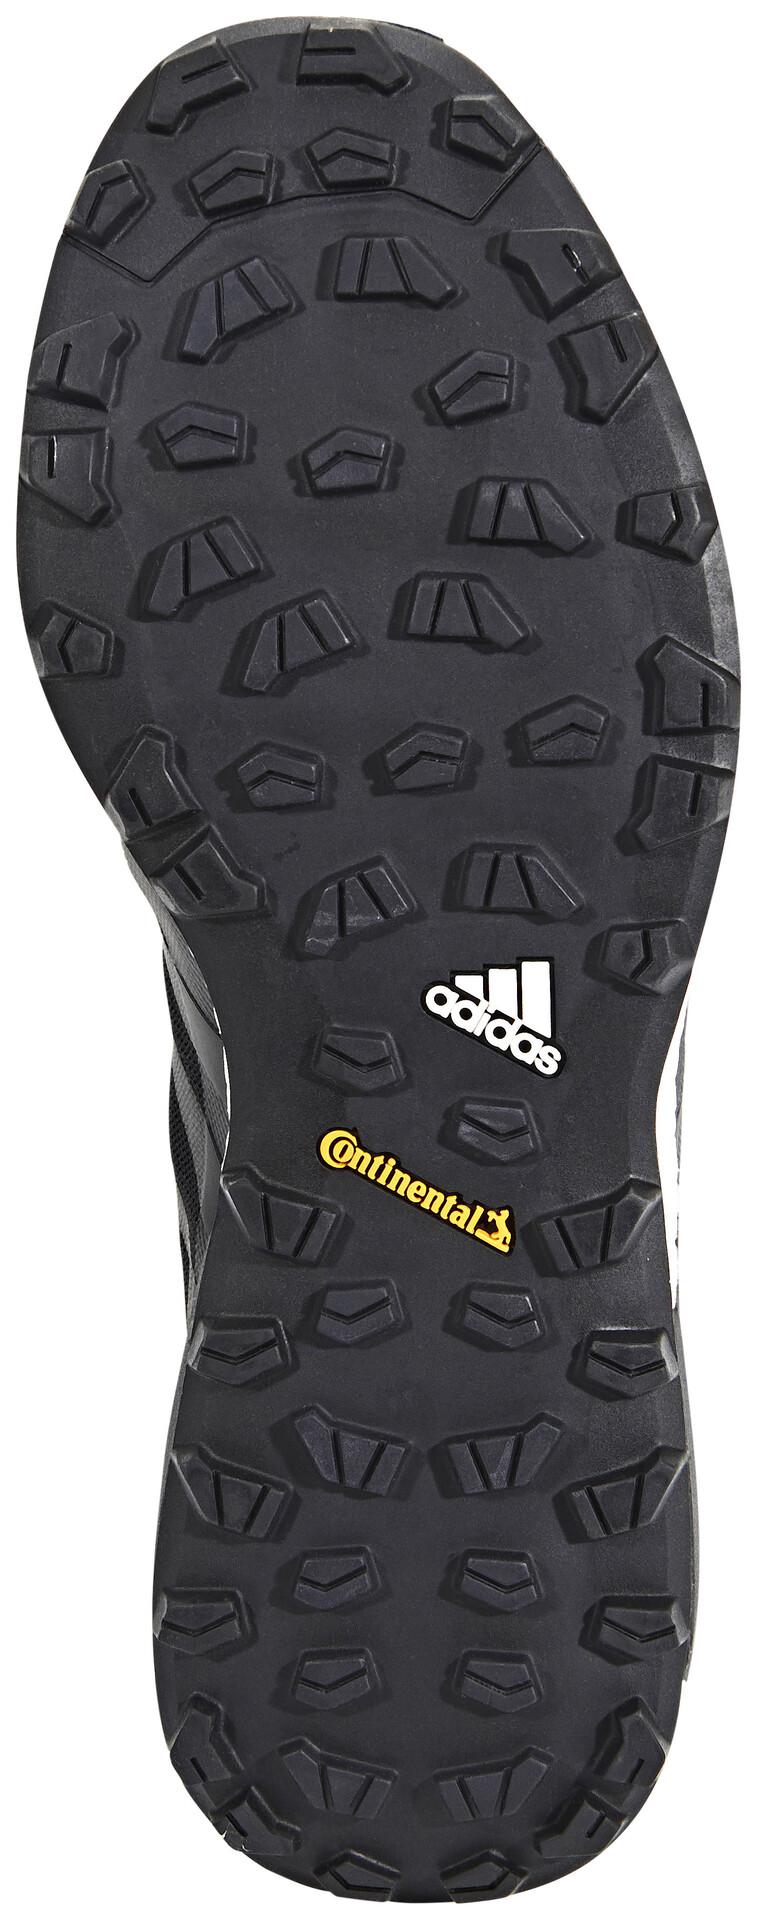 adidas TERREX Agravic Chaussures Homme, core blackcore blackvista grey